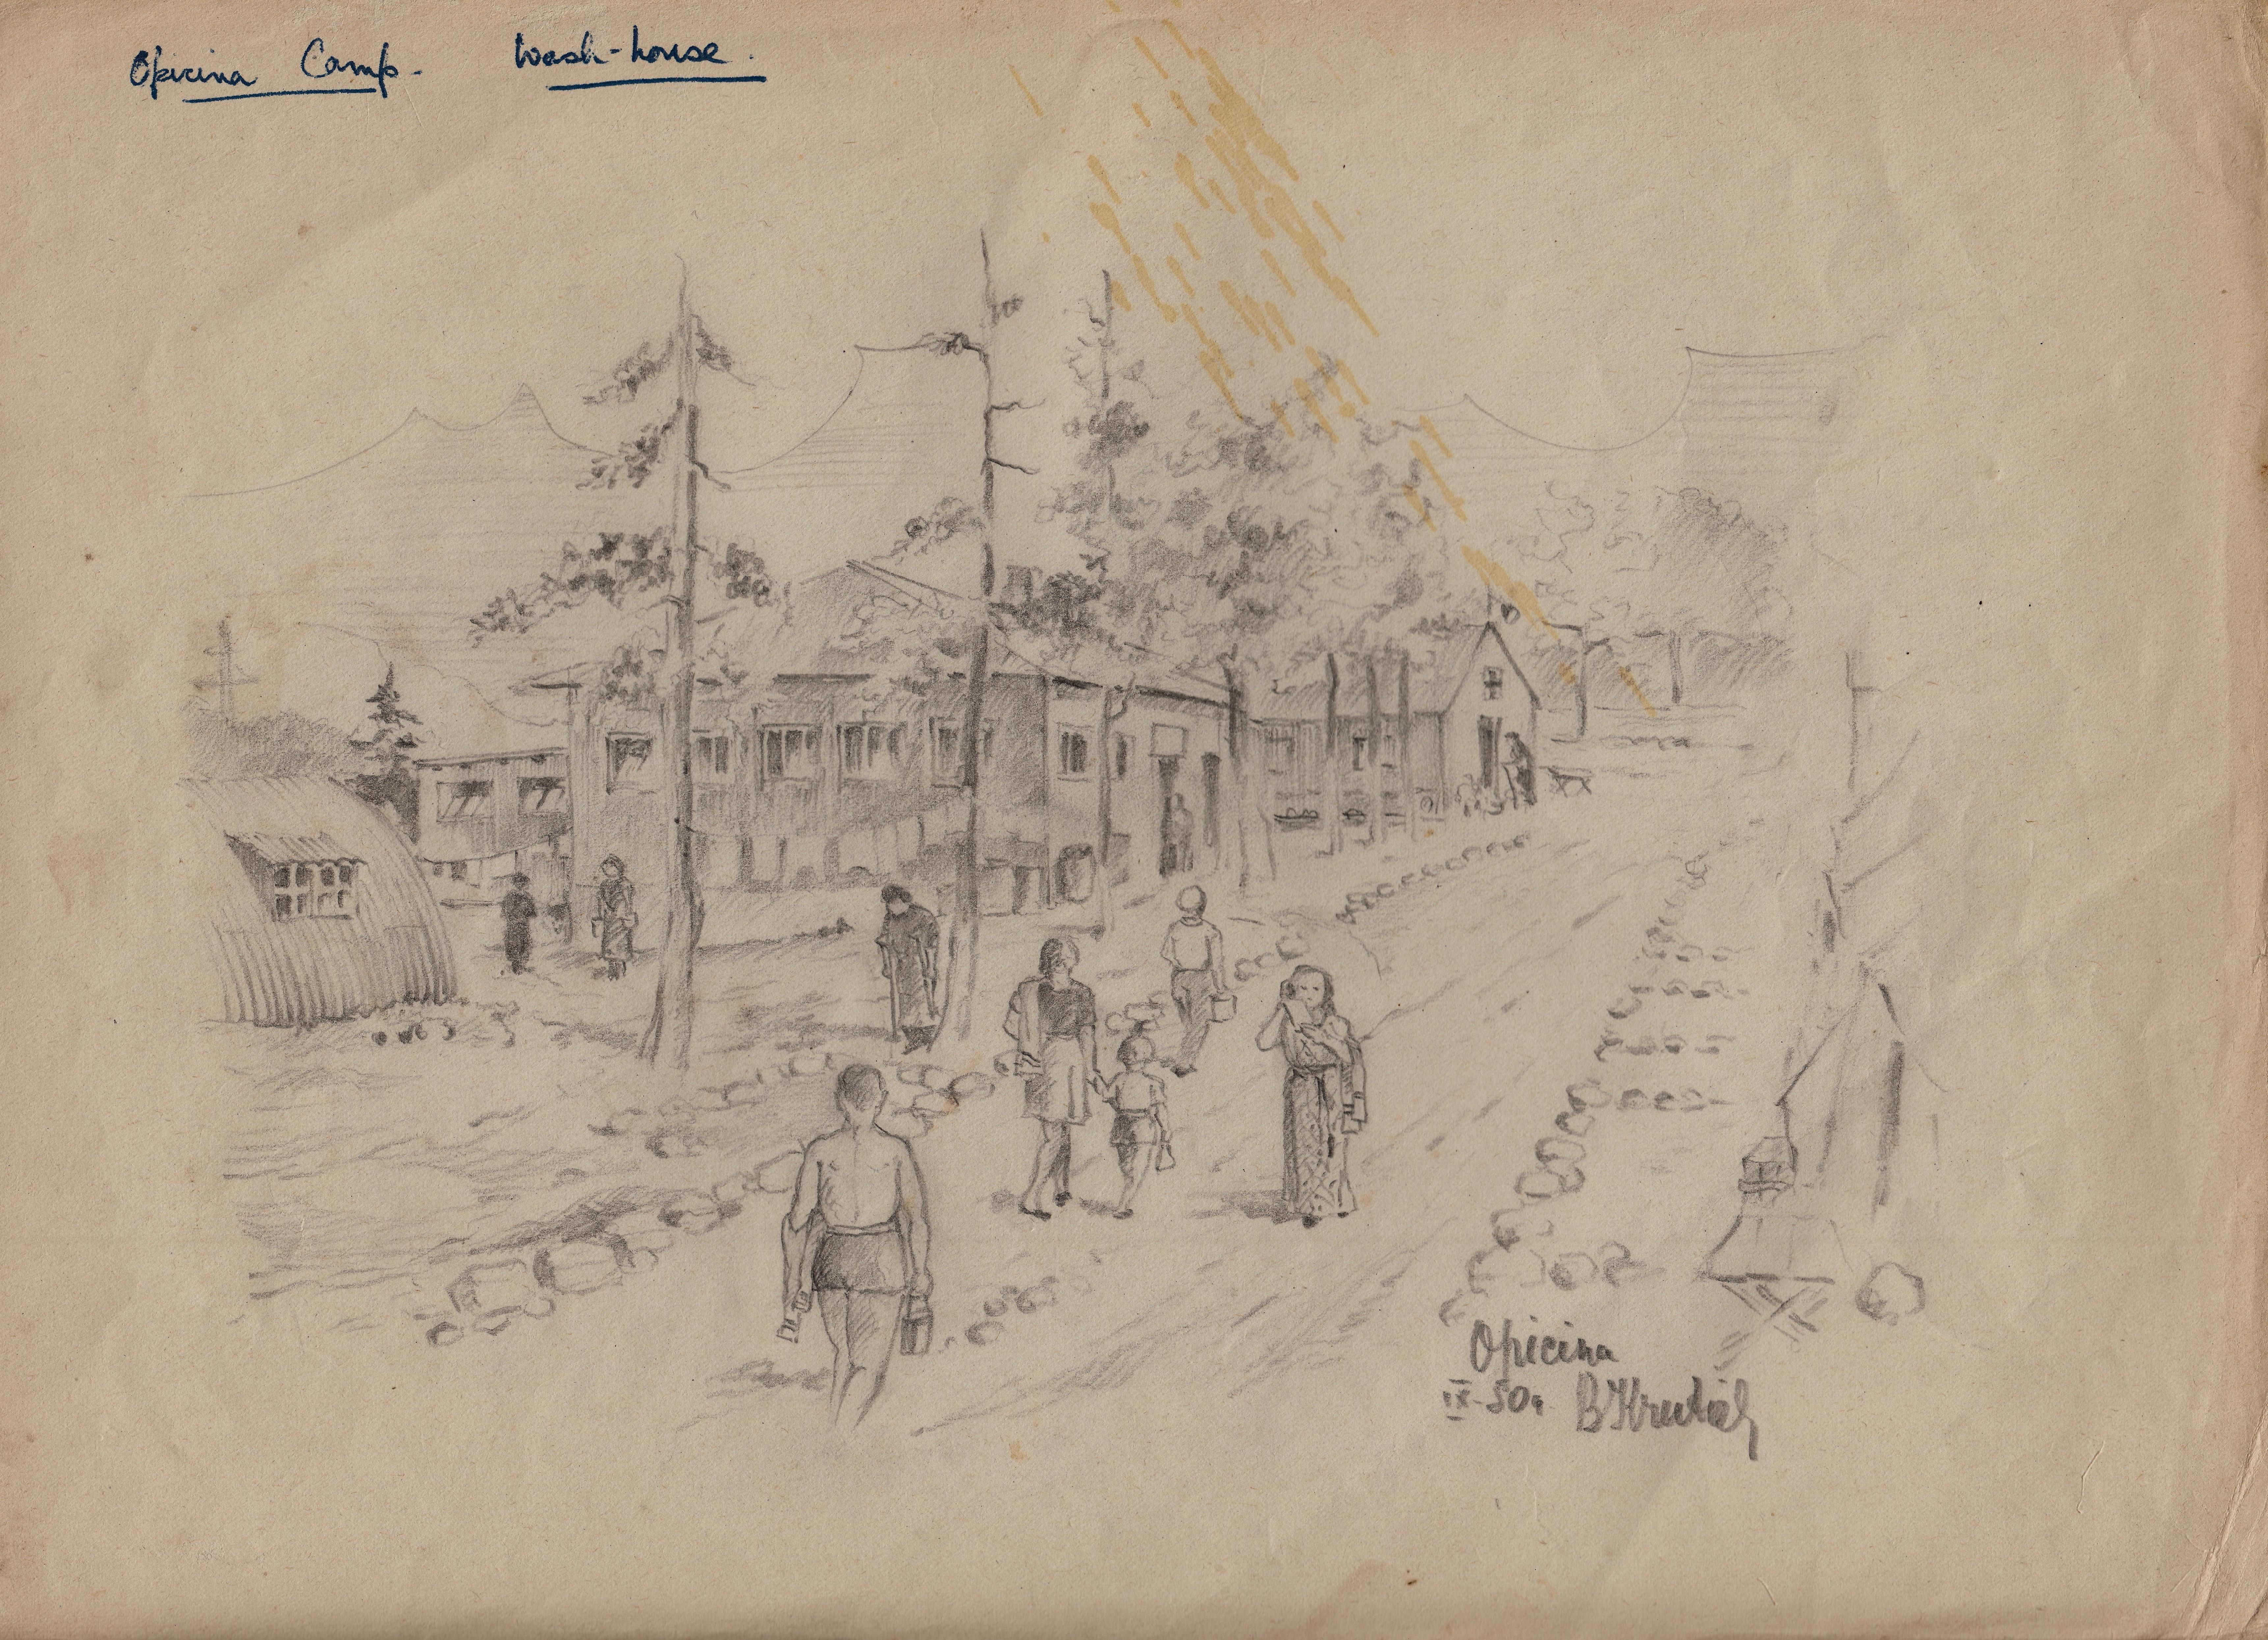 Opinina camp wash house Artist B. Krutiev 1950